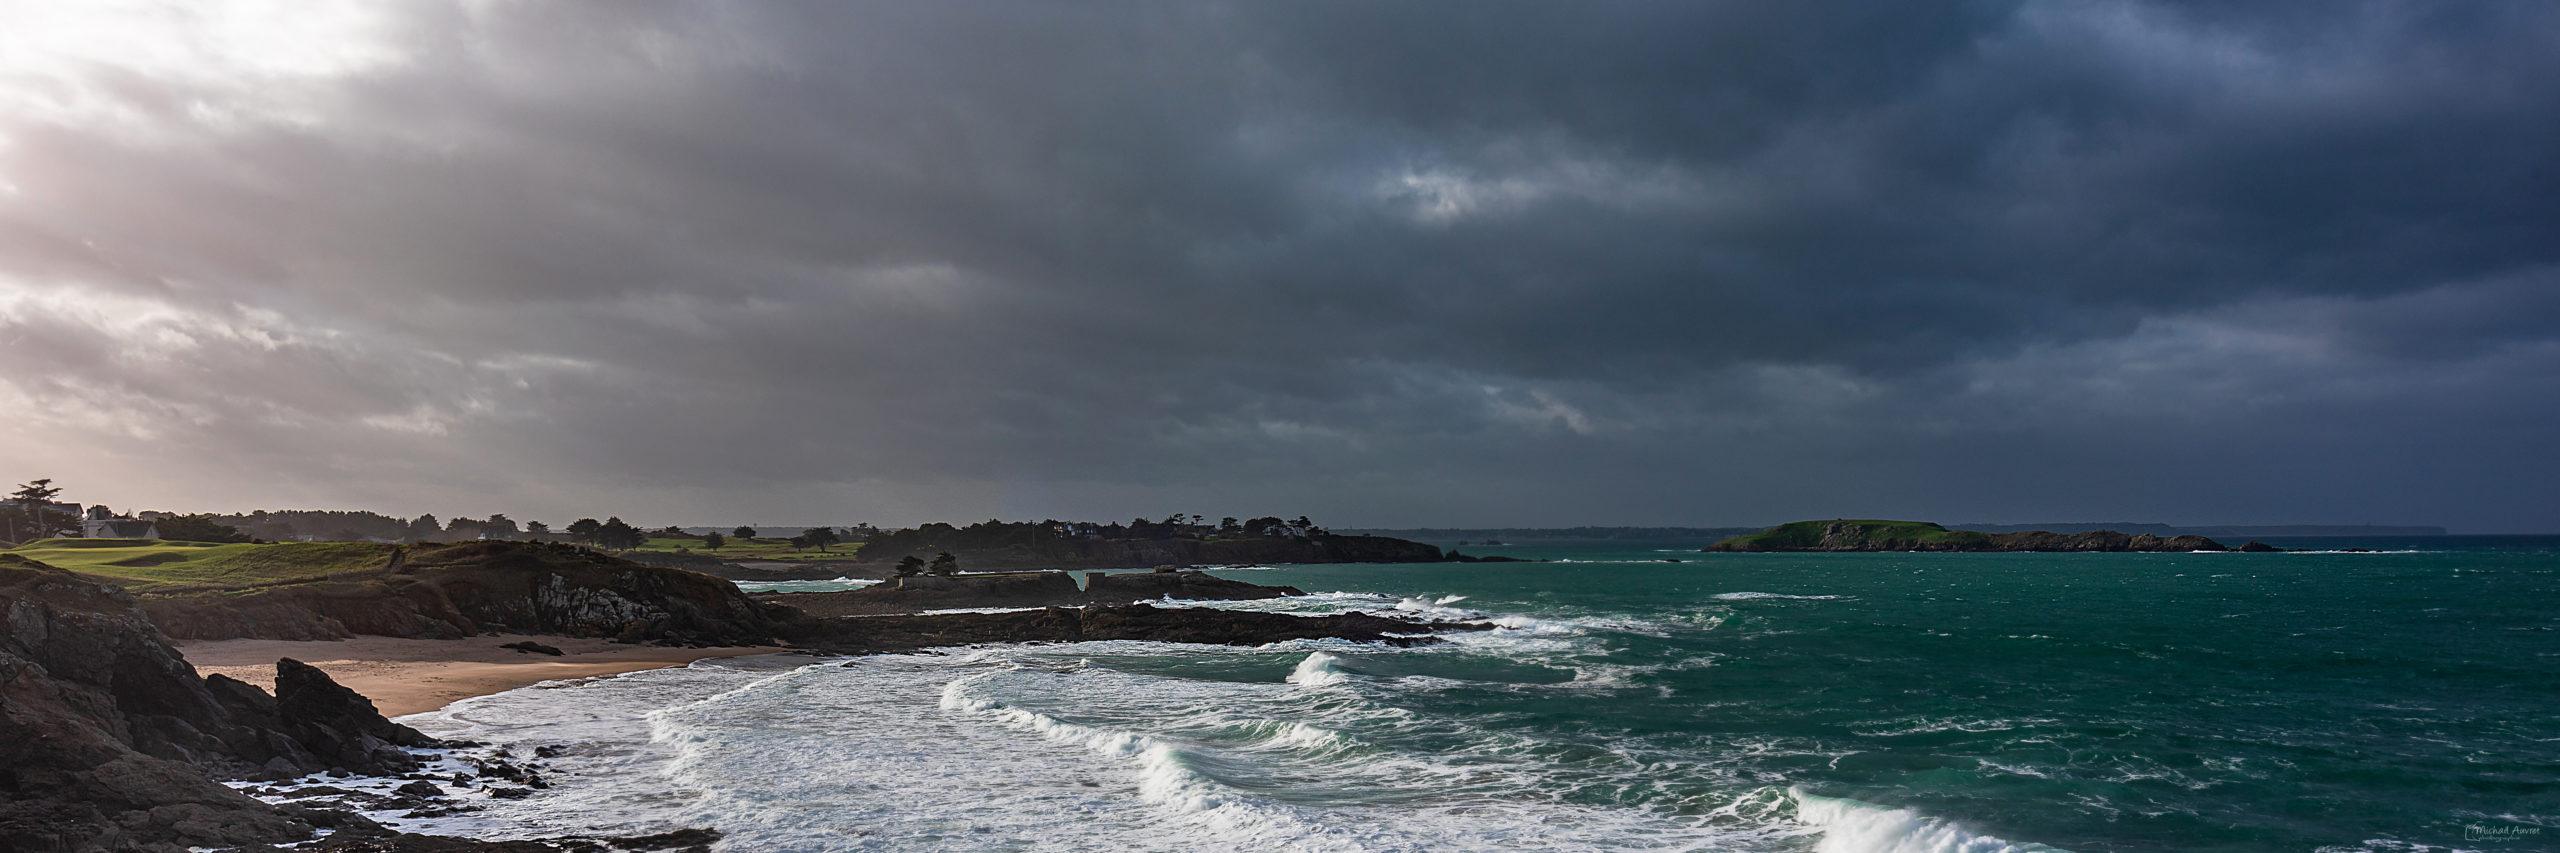 panoramique saint Briac bretagne orage lumière